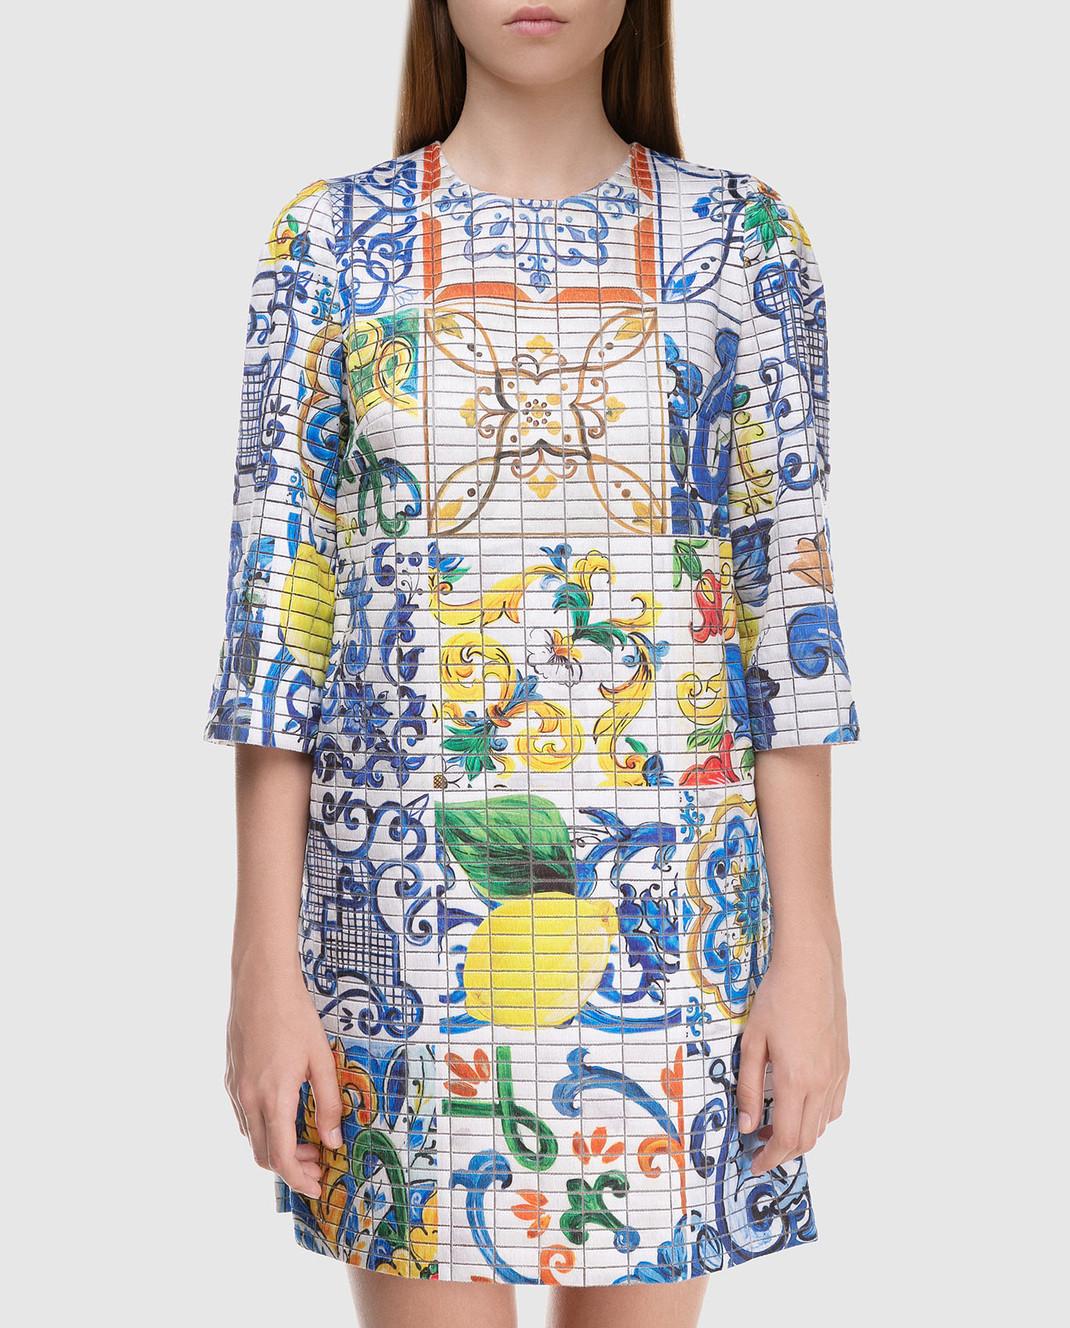 Dolce&Gabbana Платье из шелка F69U8THSMRW изображение 3